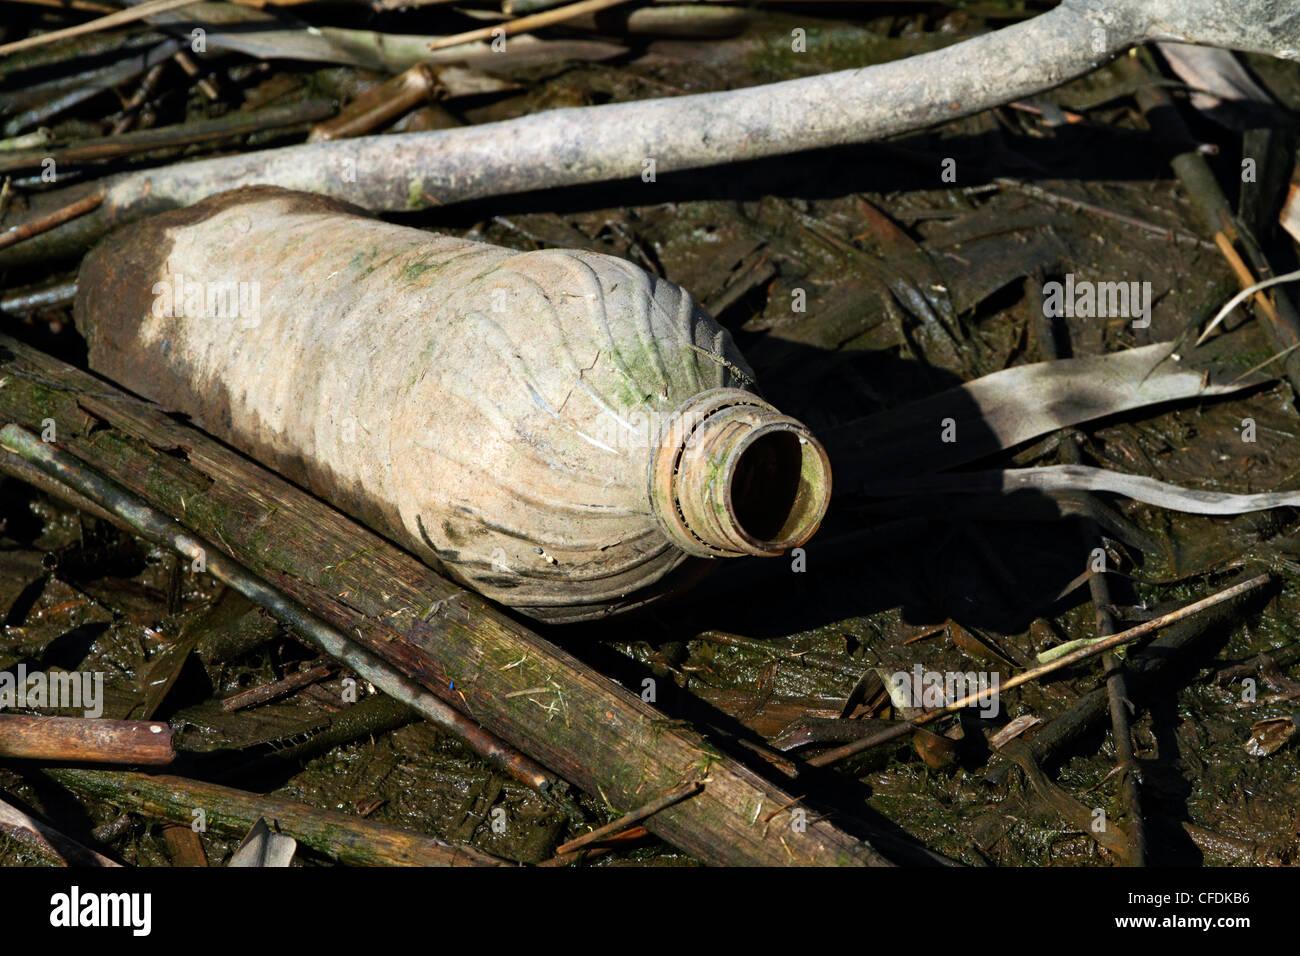 A discarded plastic water bottle at low tide in a Meadowlands saltmarsh. Richard DeKorte Park, Lyndhurst, New Jersey, - Stock Image